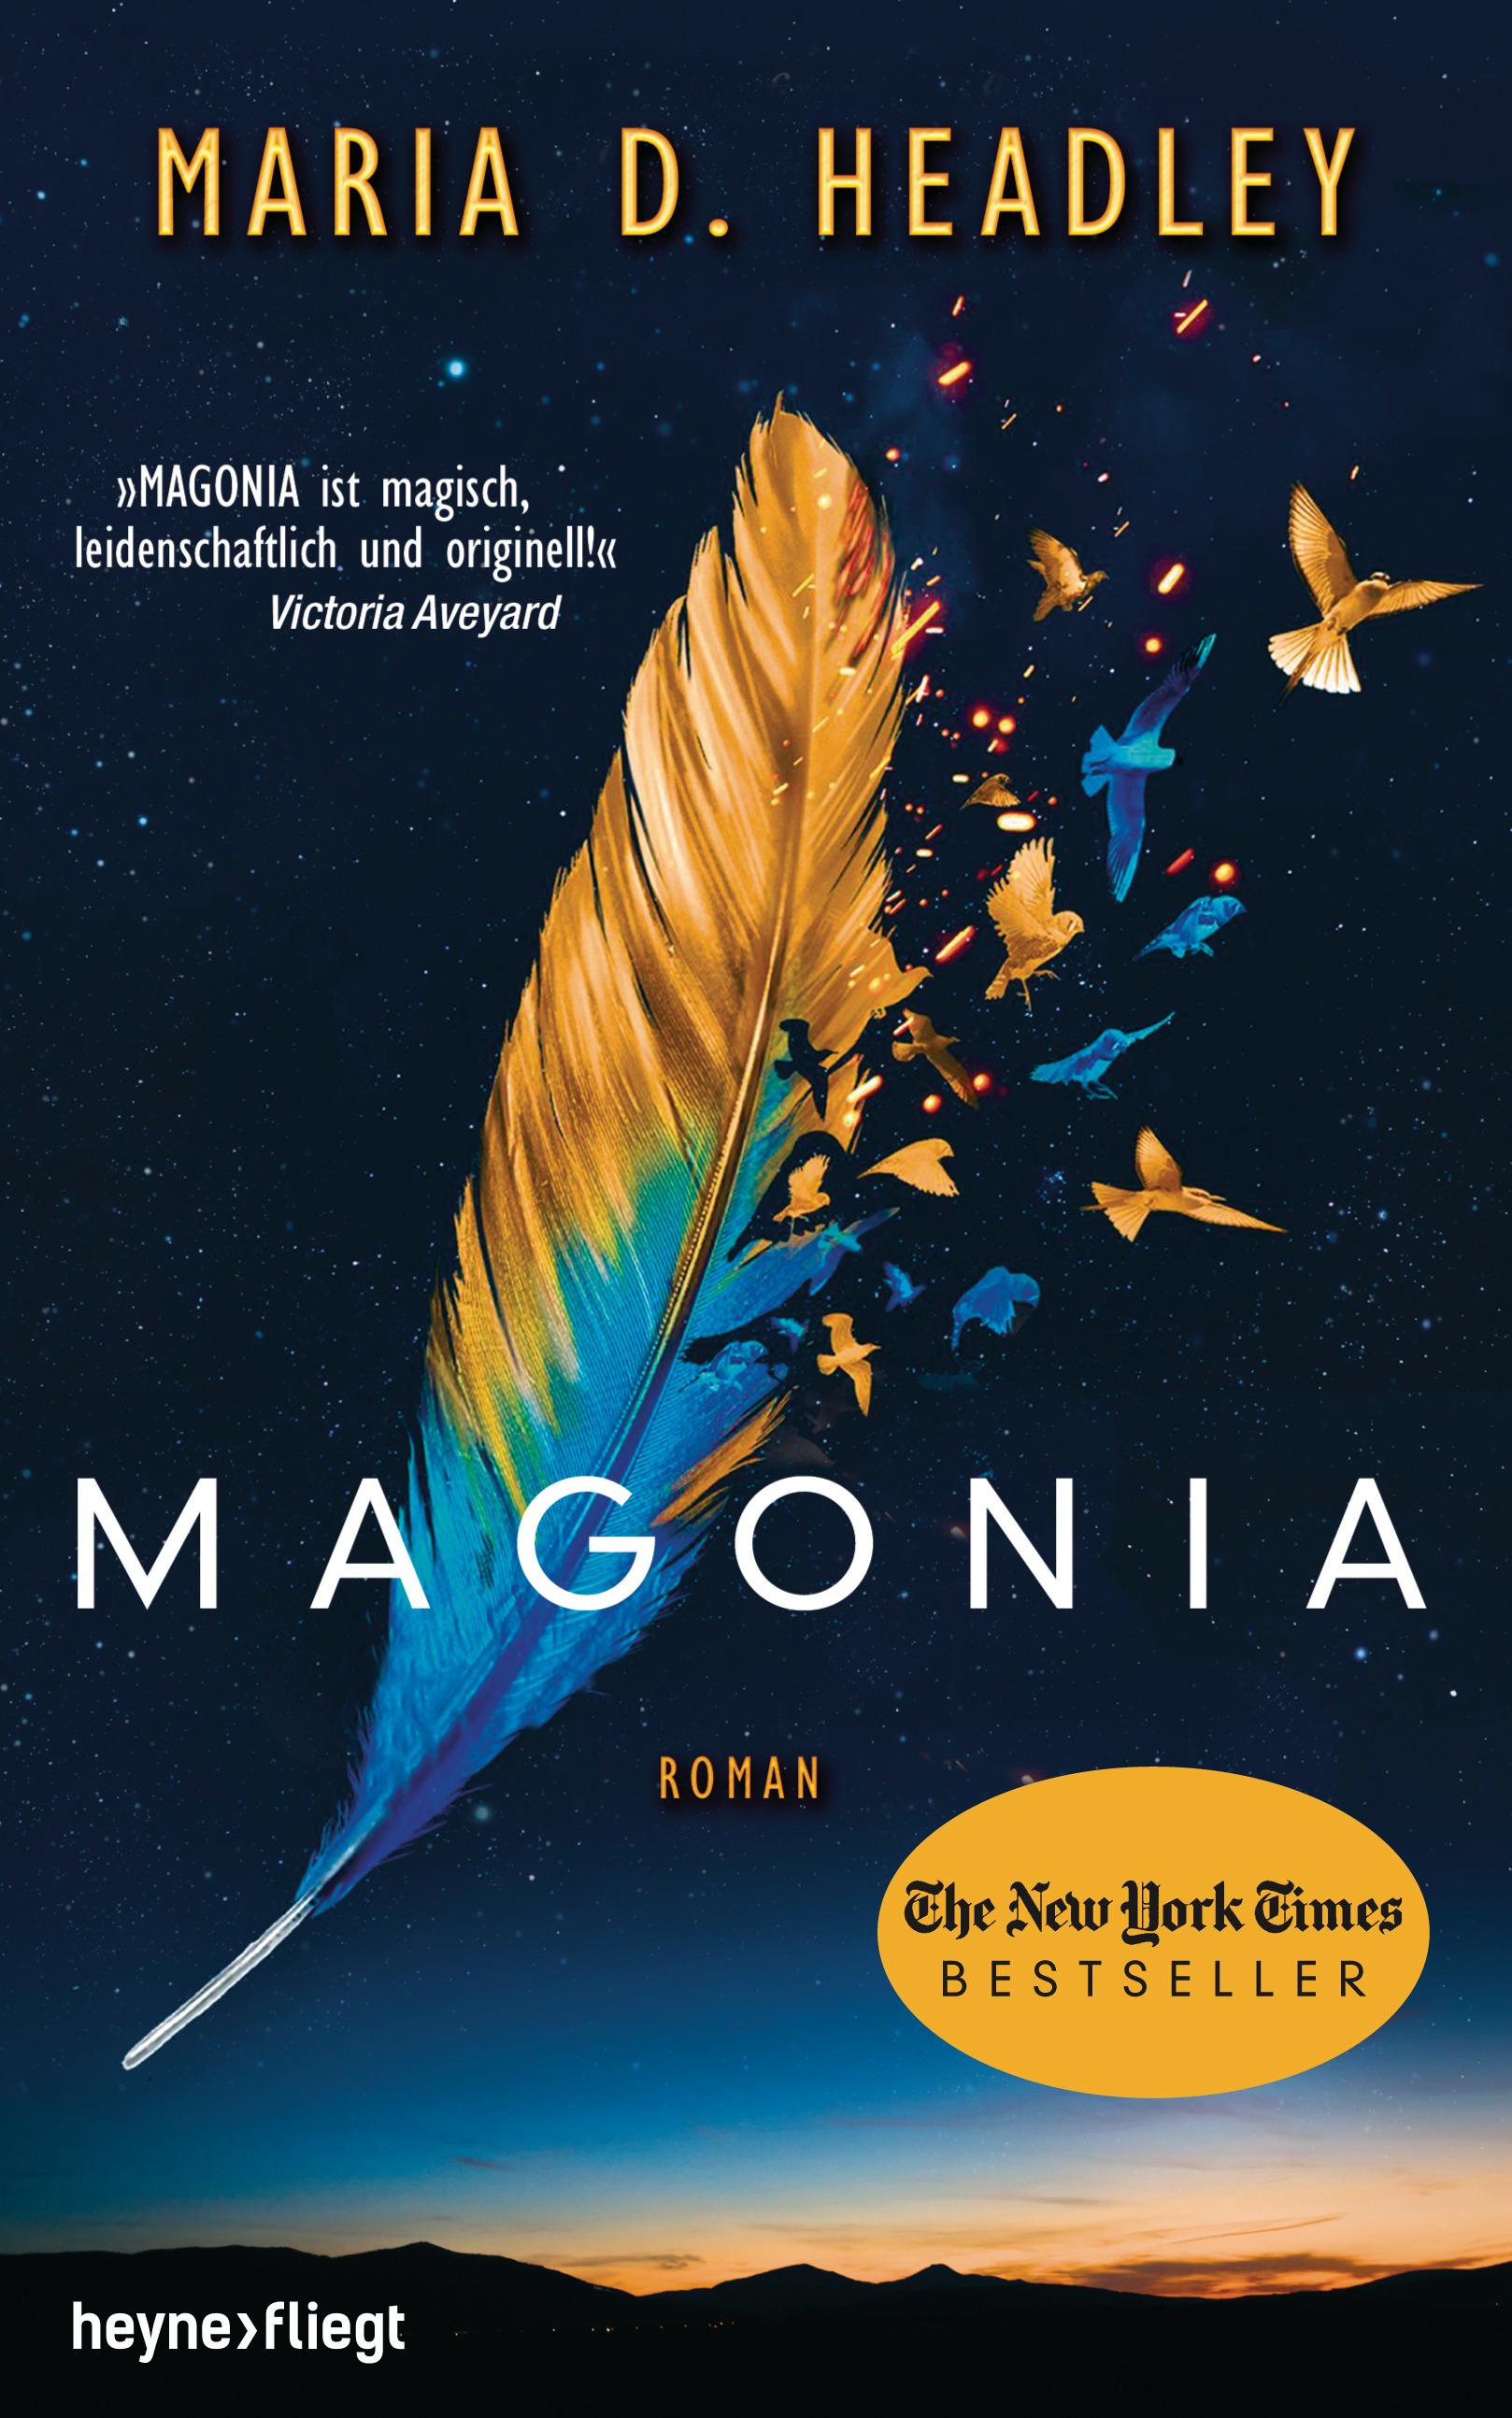 Magonia - Wunschliste